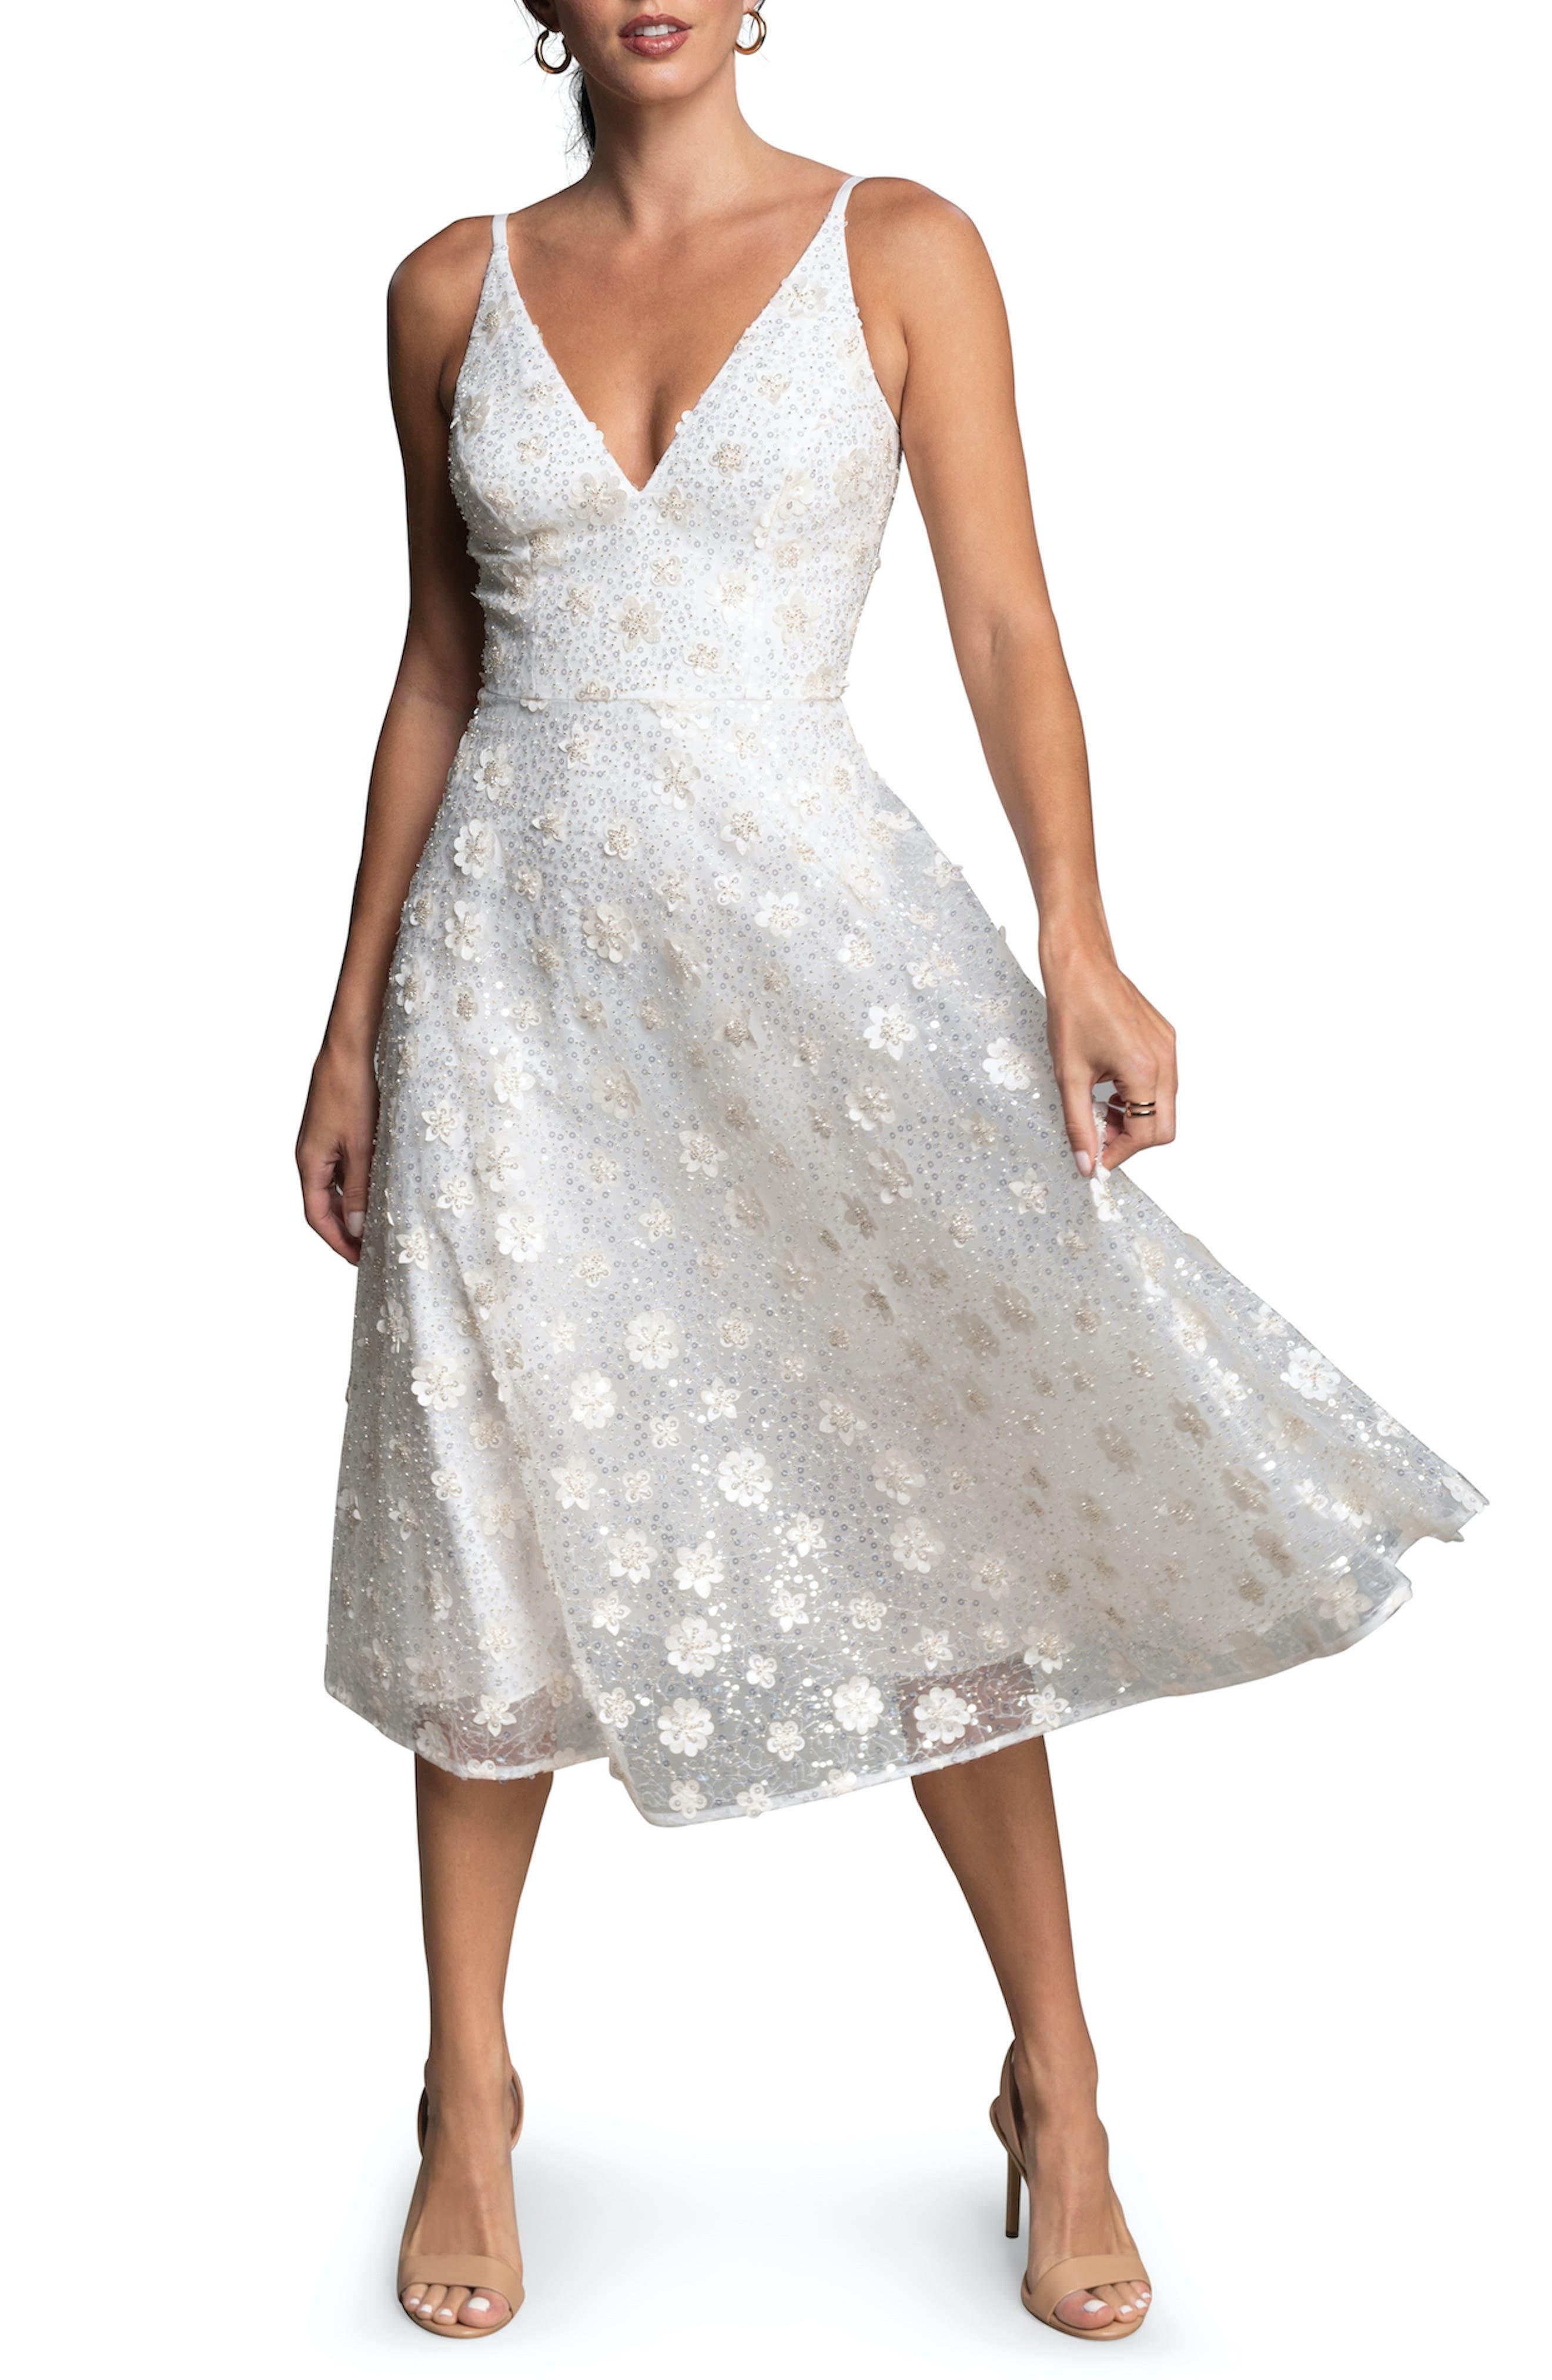 Elisa Floral Applique Sequin Fit & Flare Dress